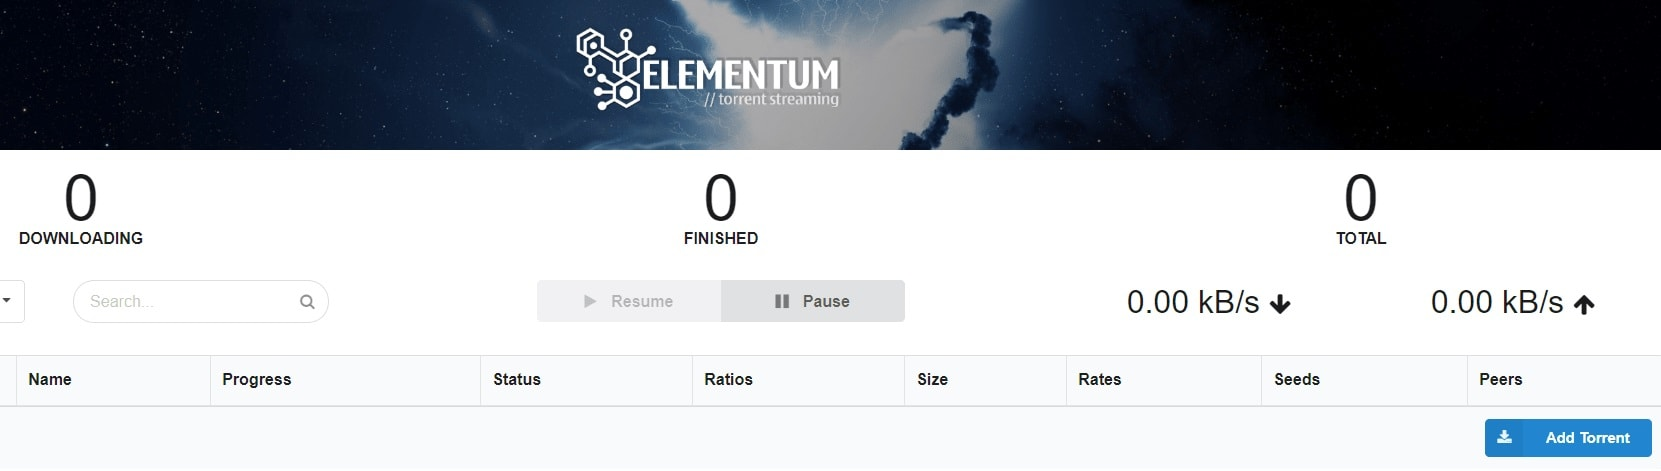 Веб интерфейс плагина Elementum